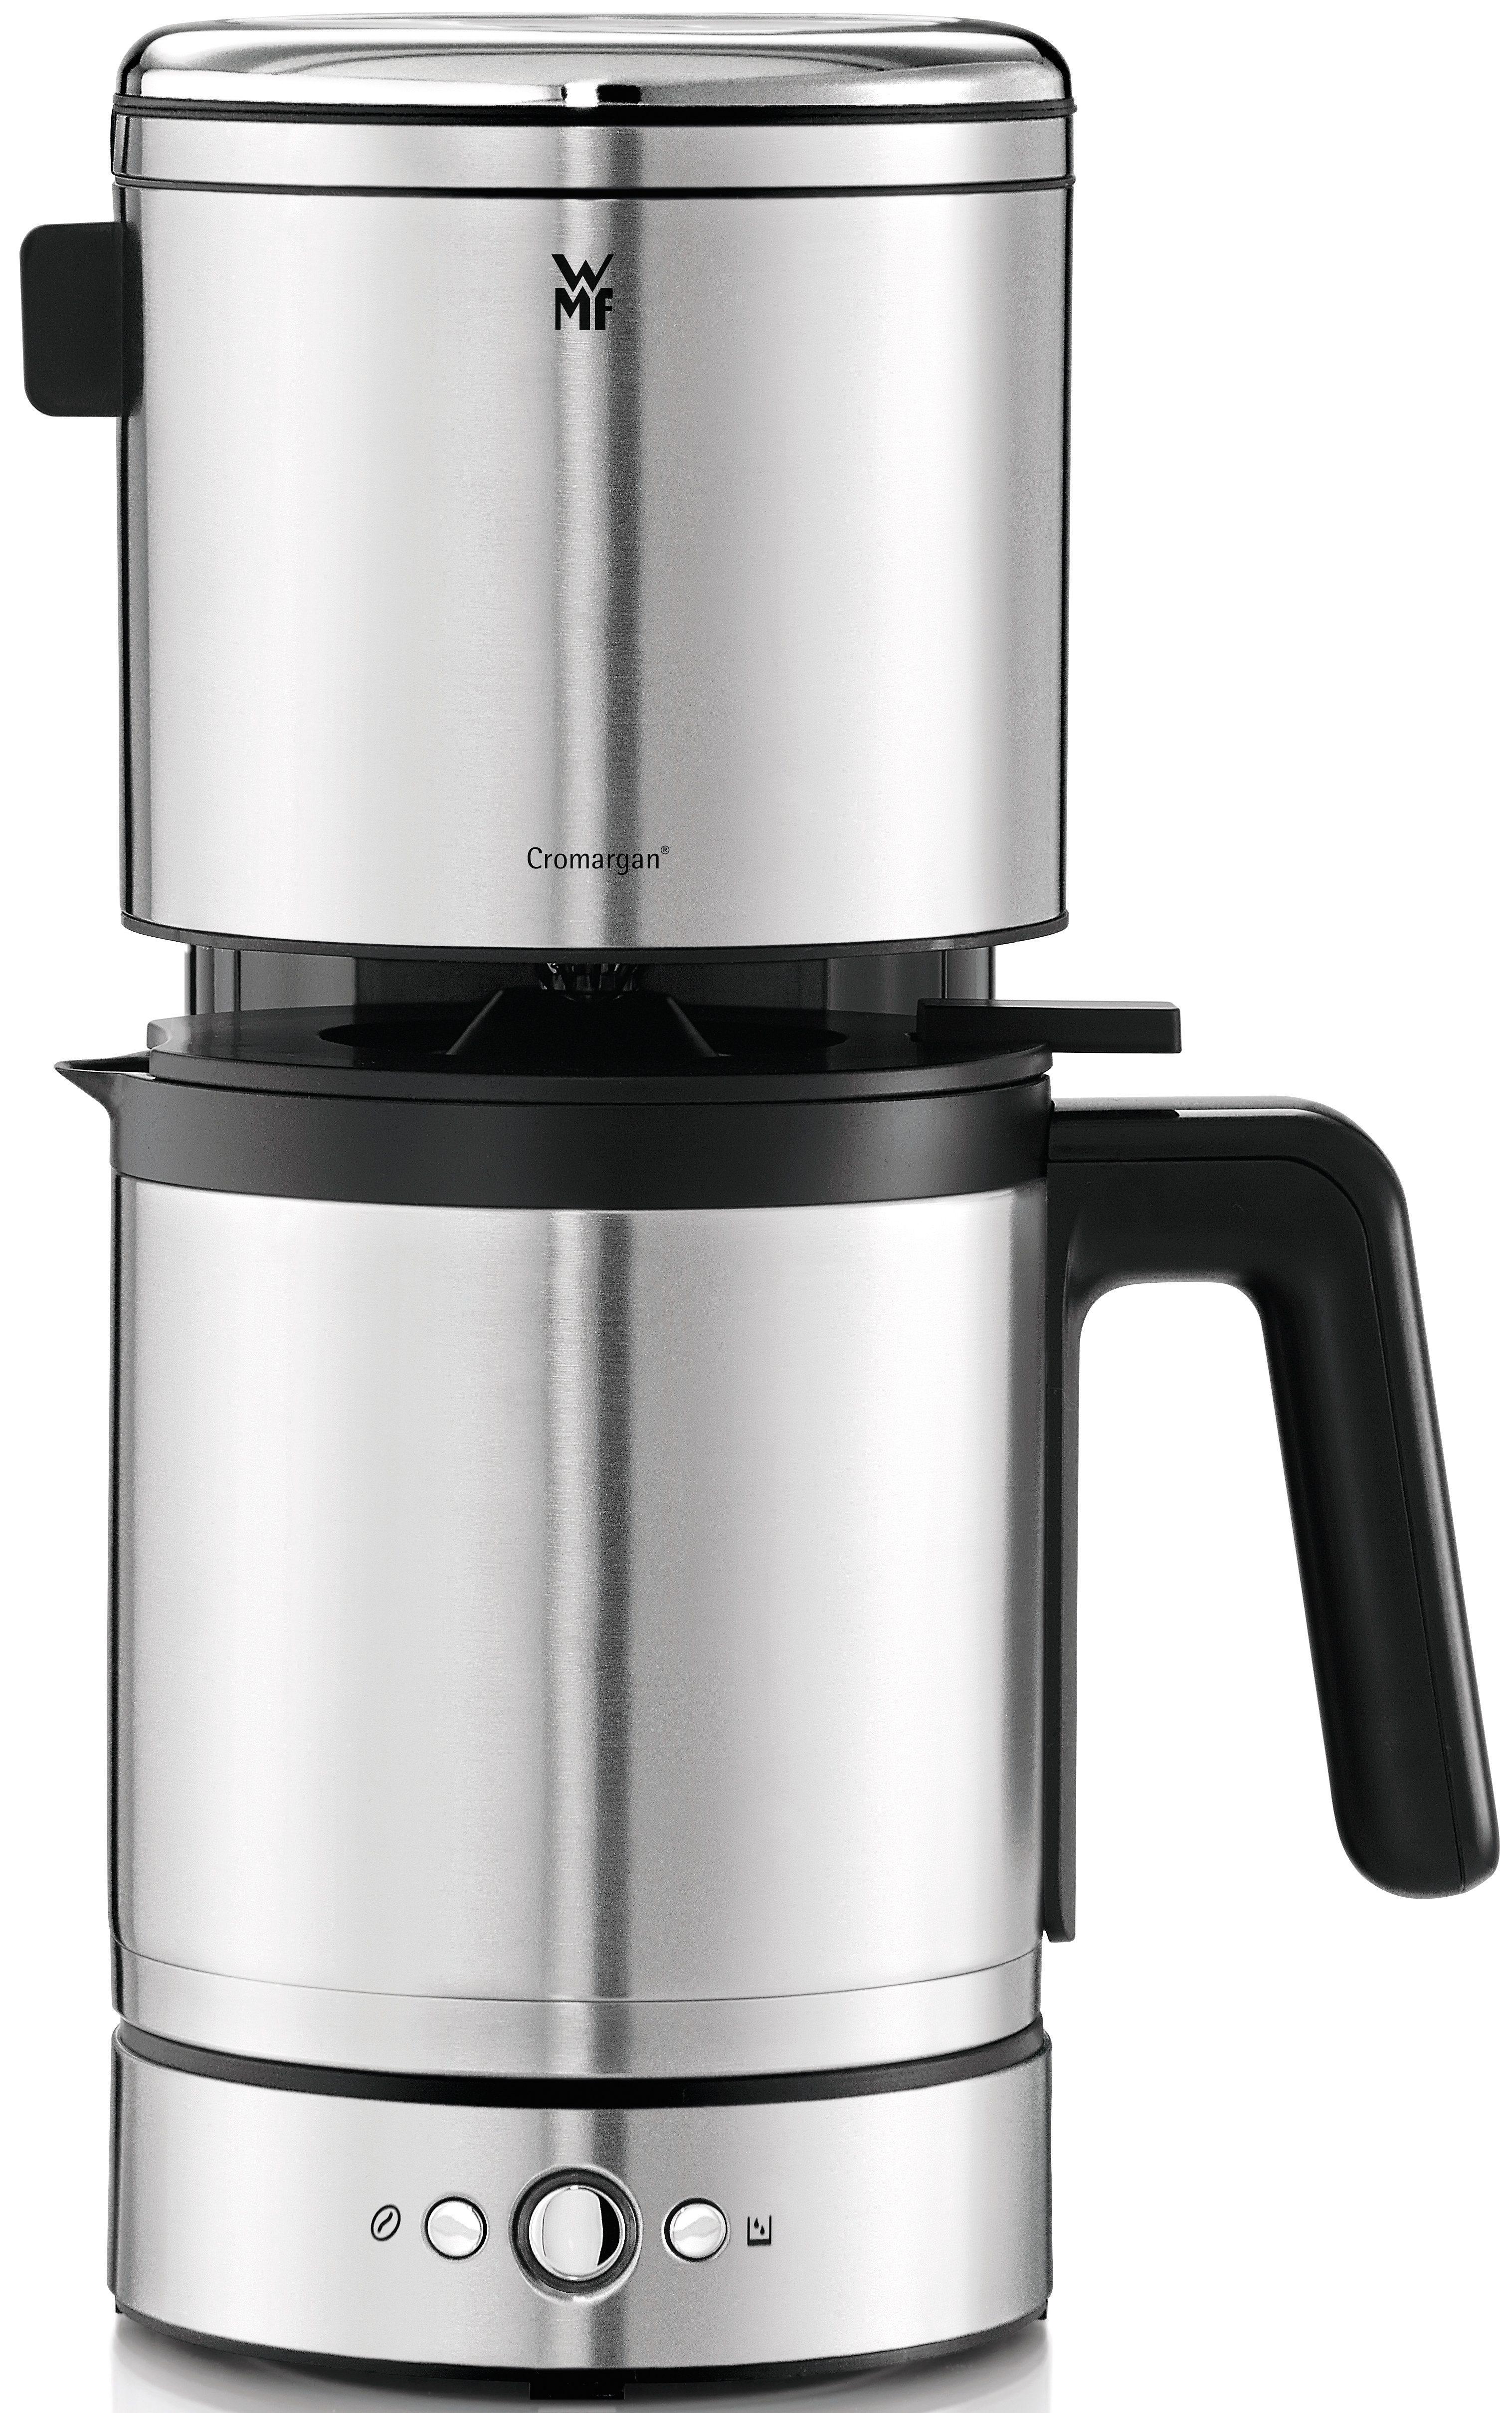 WMF Filterkaffeemaschine LONO, 1,25l Kaffeekanne, Papierfilter, mit Thermokanne